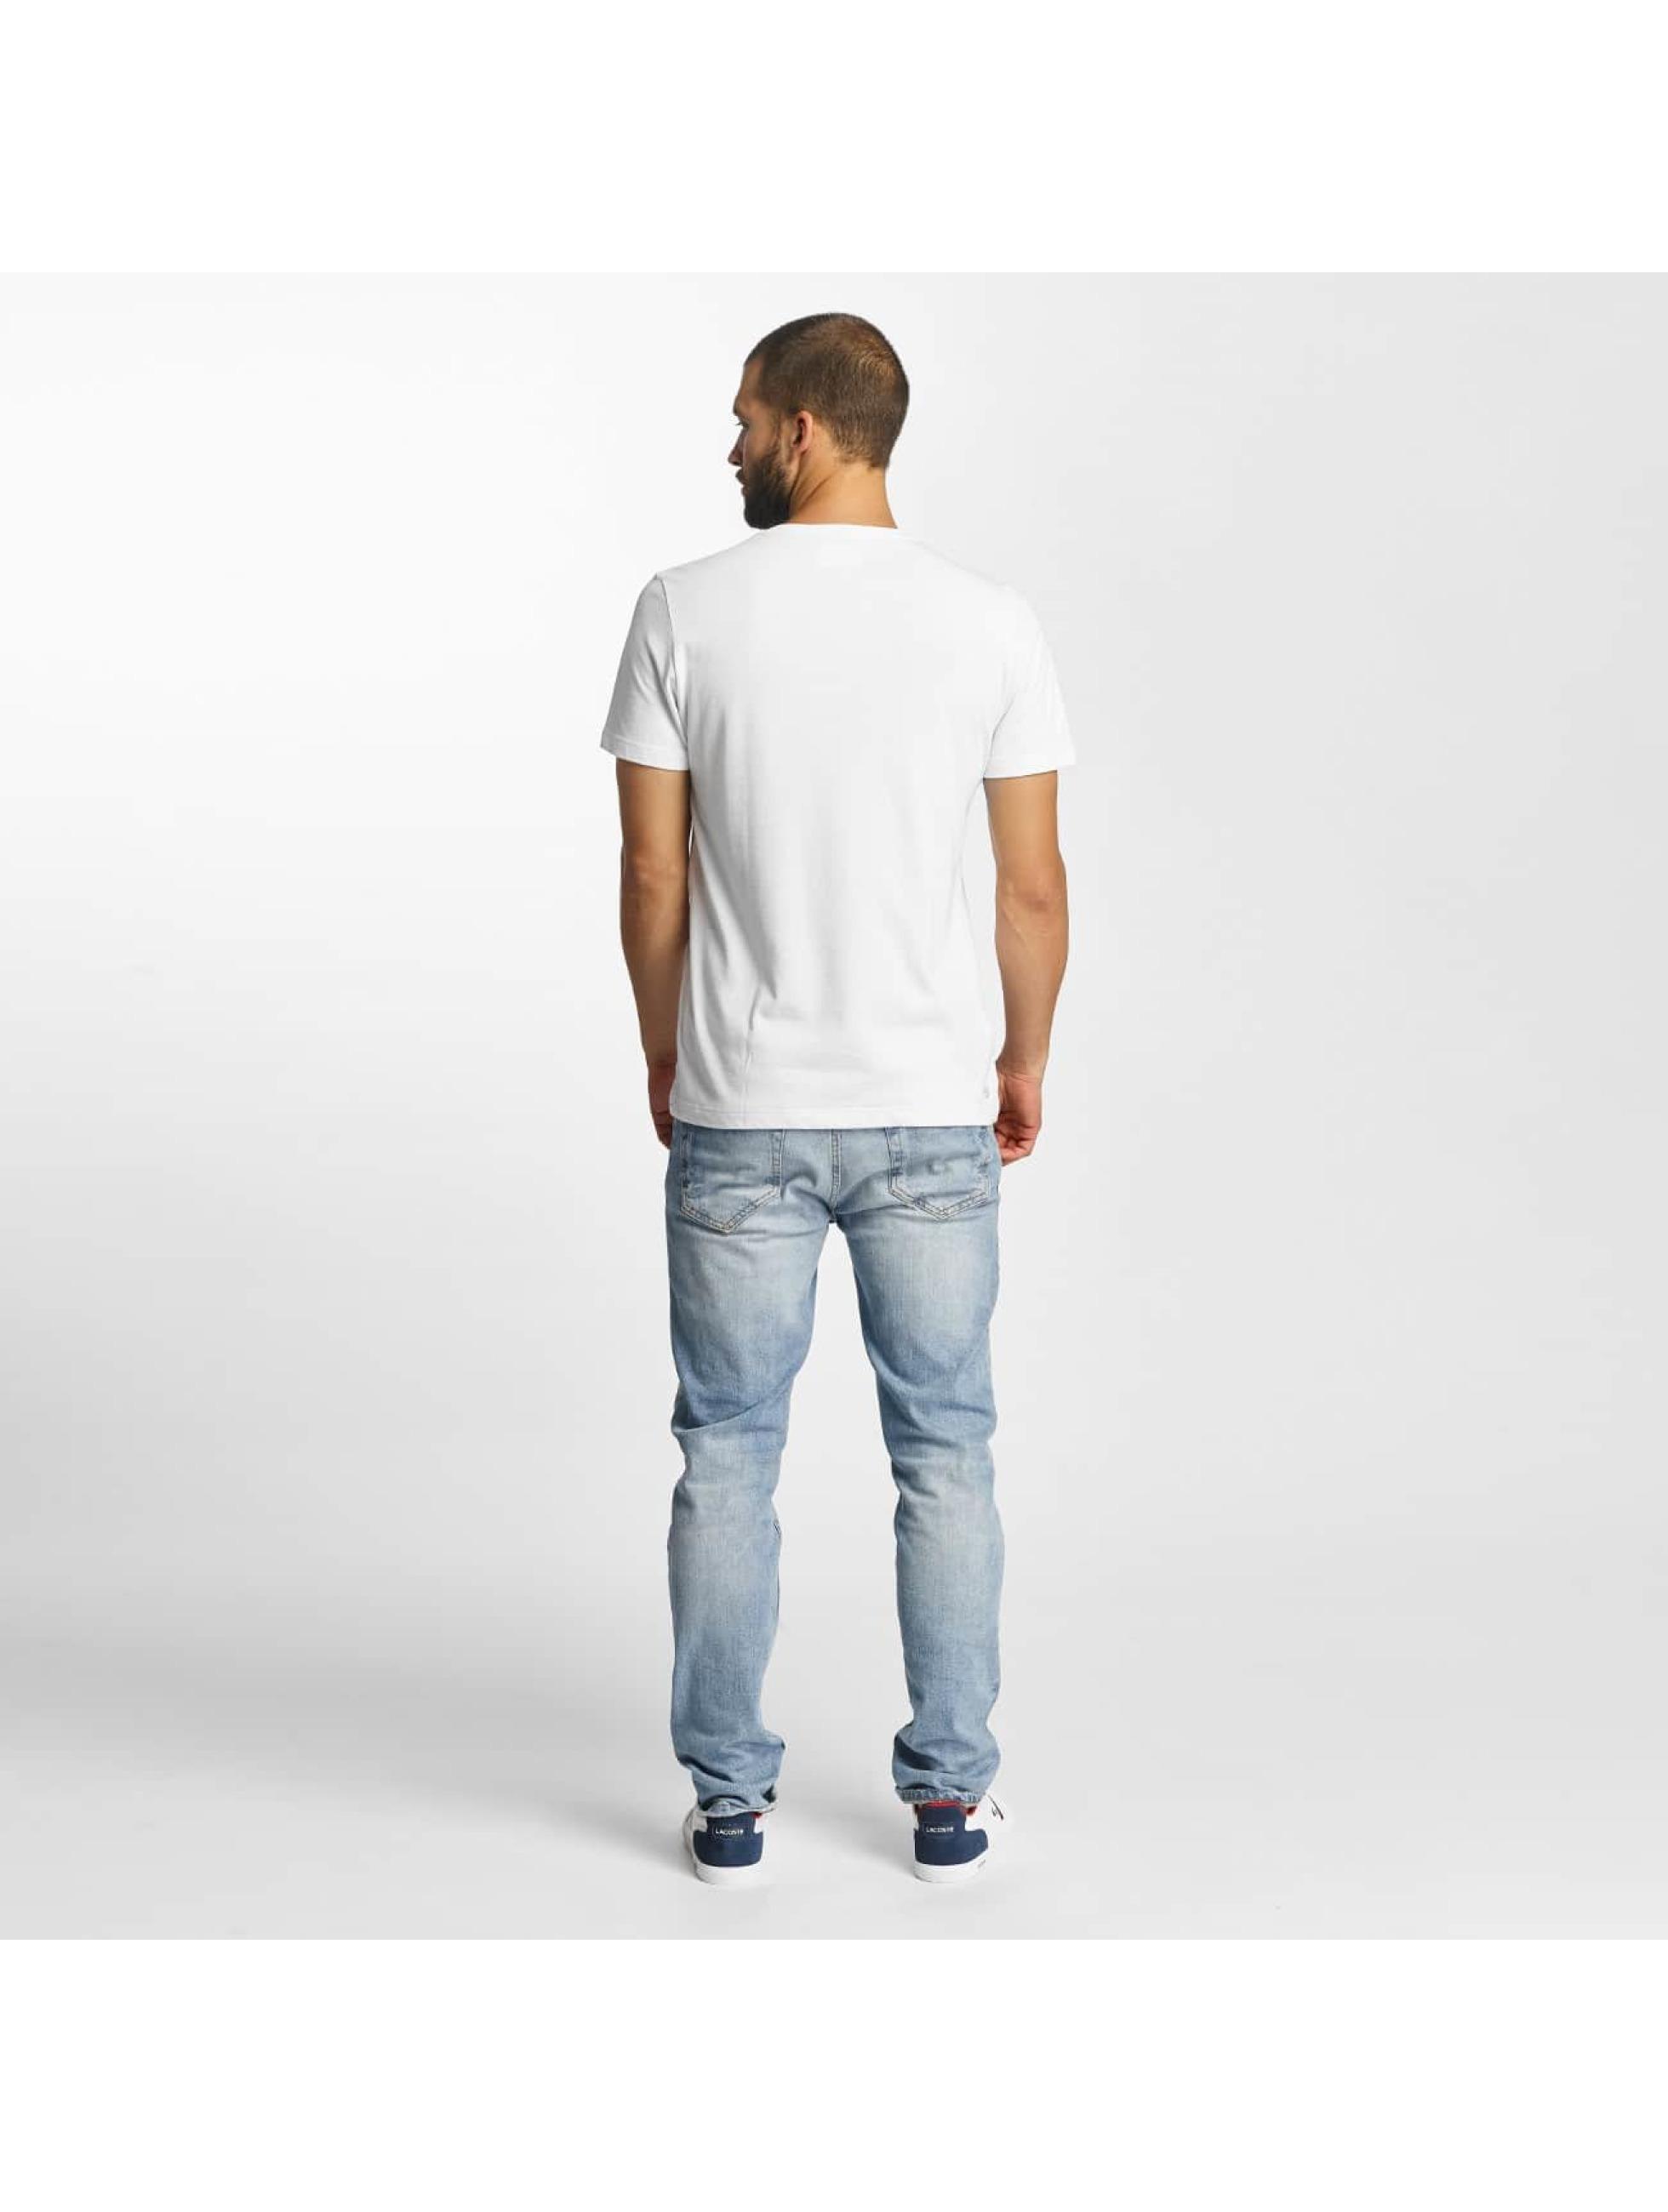 Lacoste T-Shirt Kroko weiß